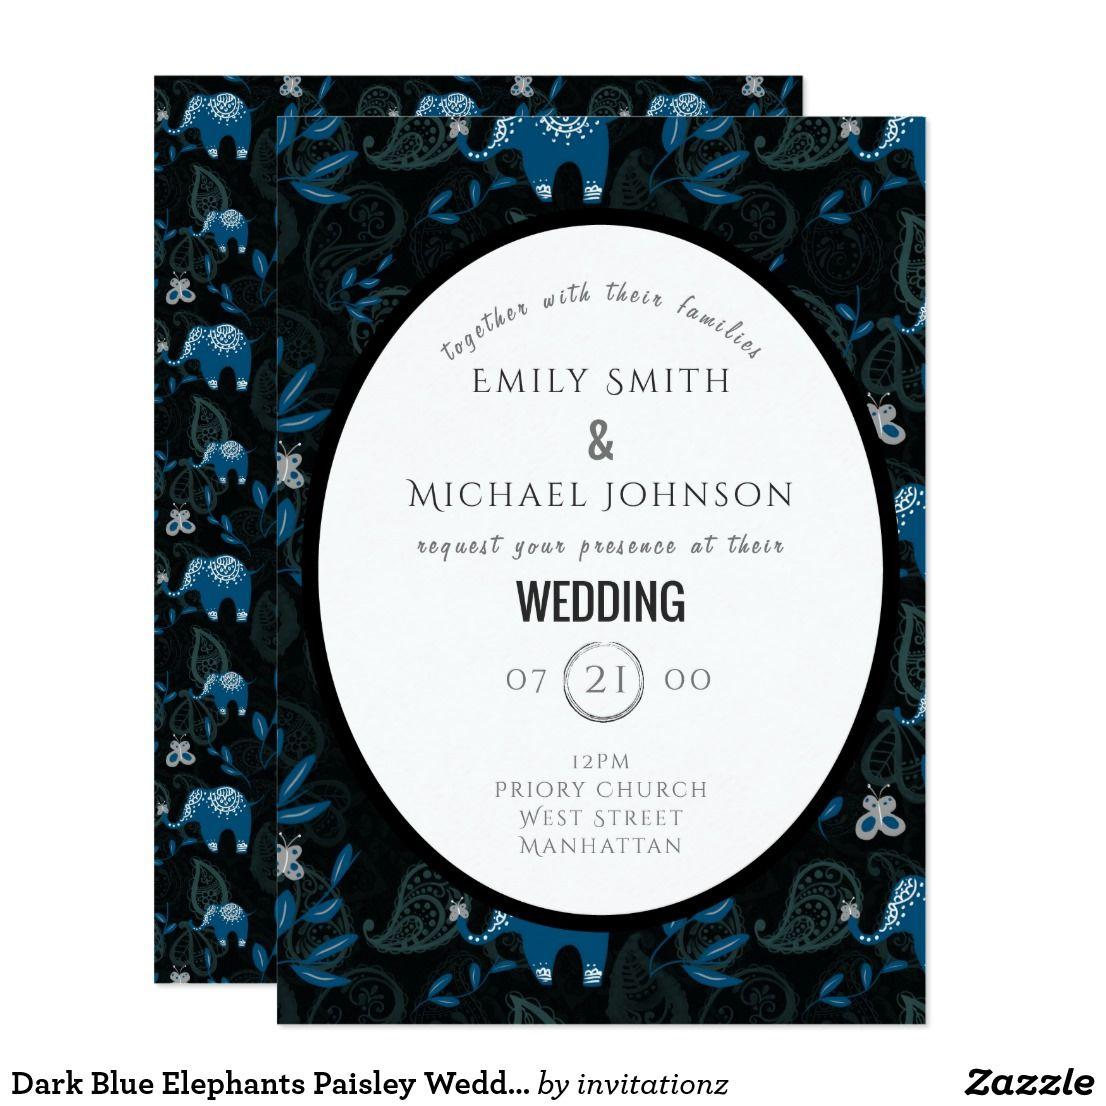 Dark Blue Elephants Paisley Wedding Invitations 2 | Trending Wedding ...